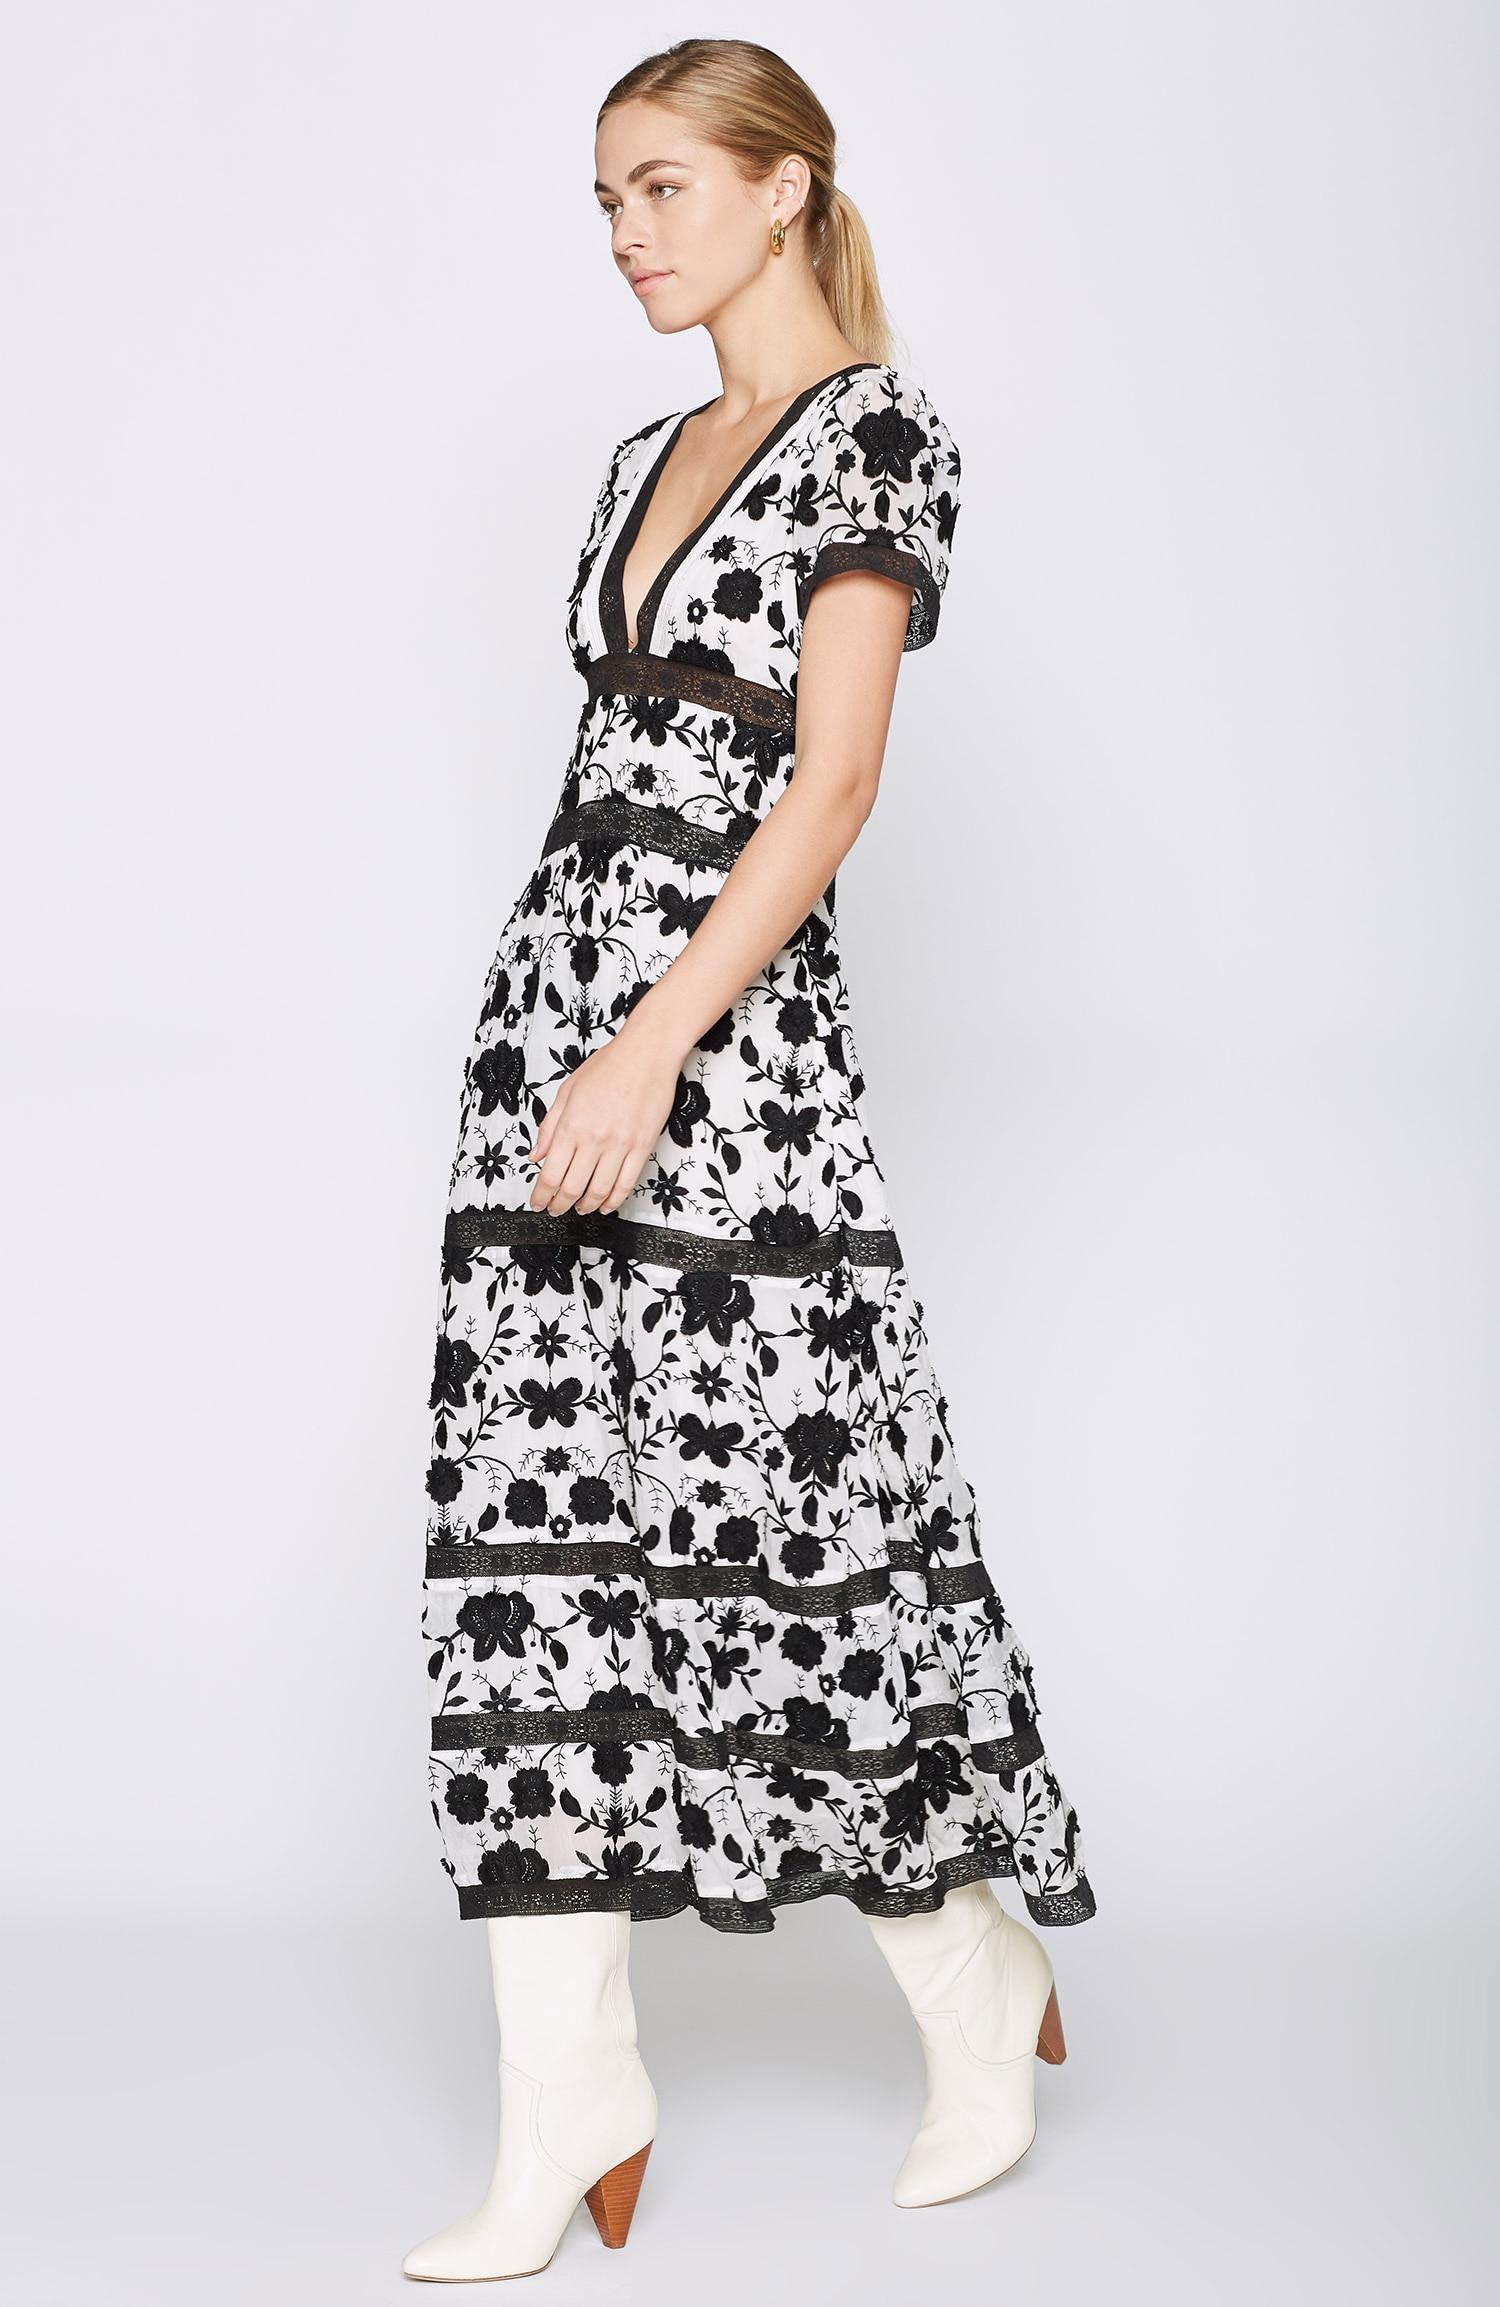 30bf703c51b Joie Fusca Maxi Dress in Black - Lyst